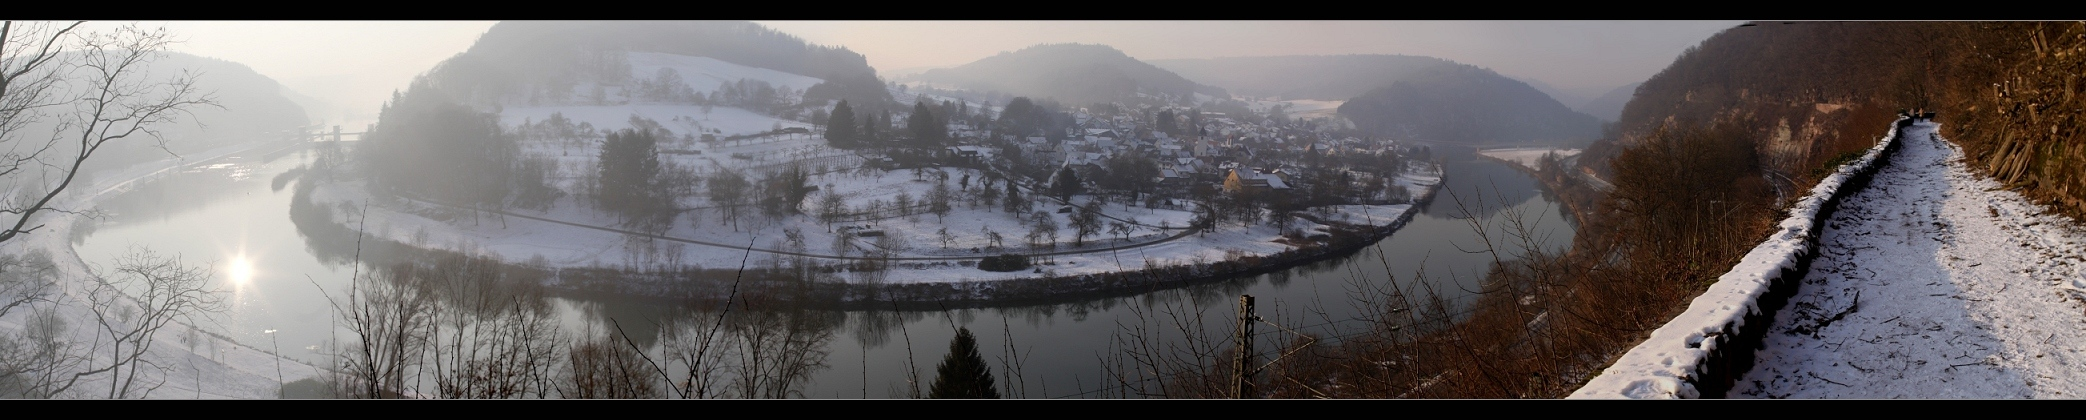 Neckar-Höhenweg-Panorama